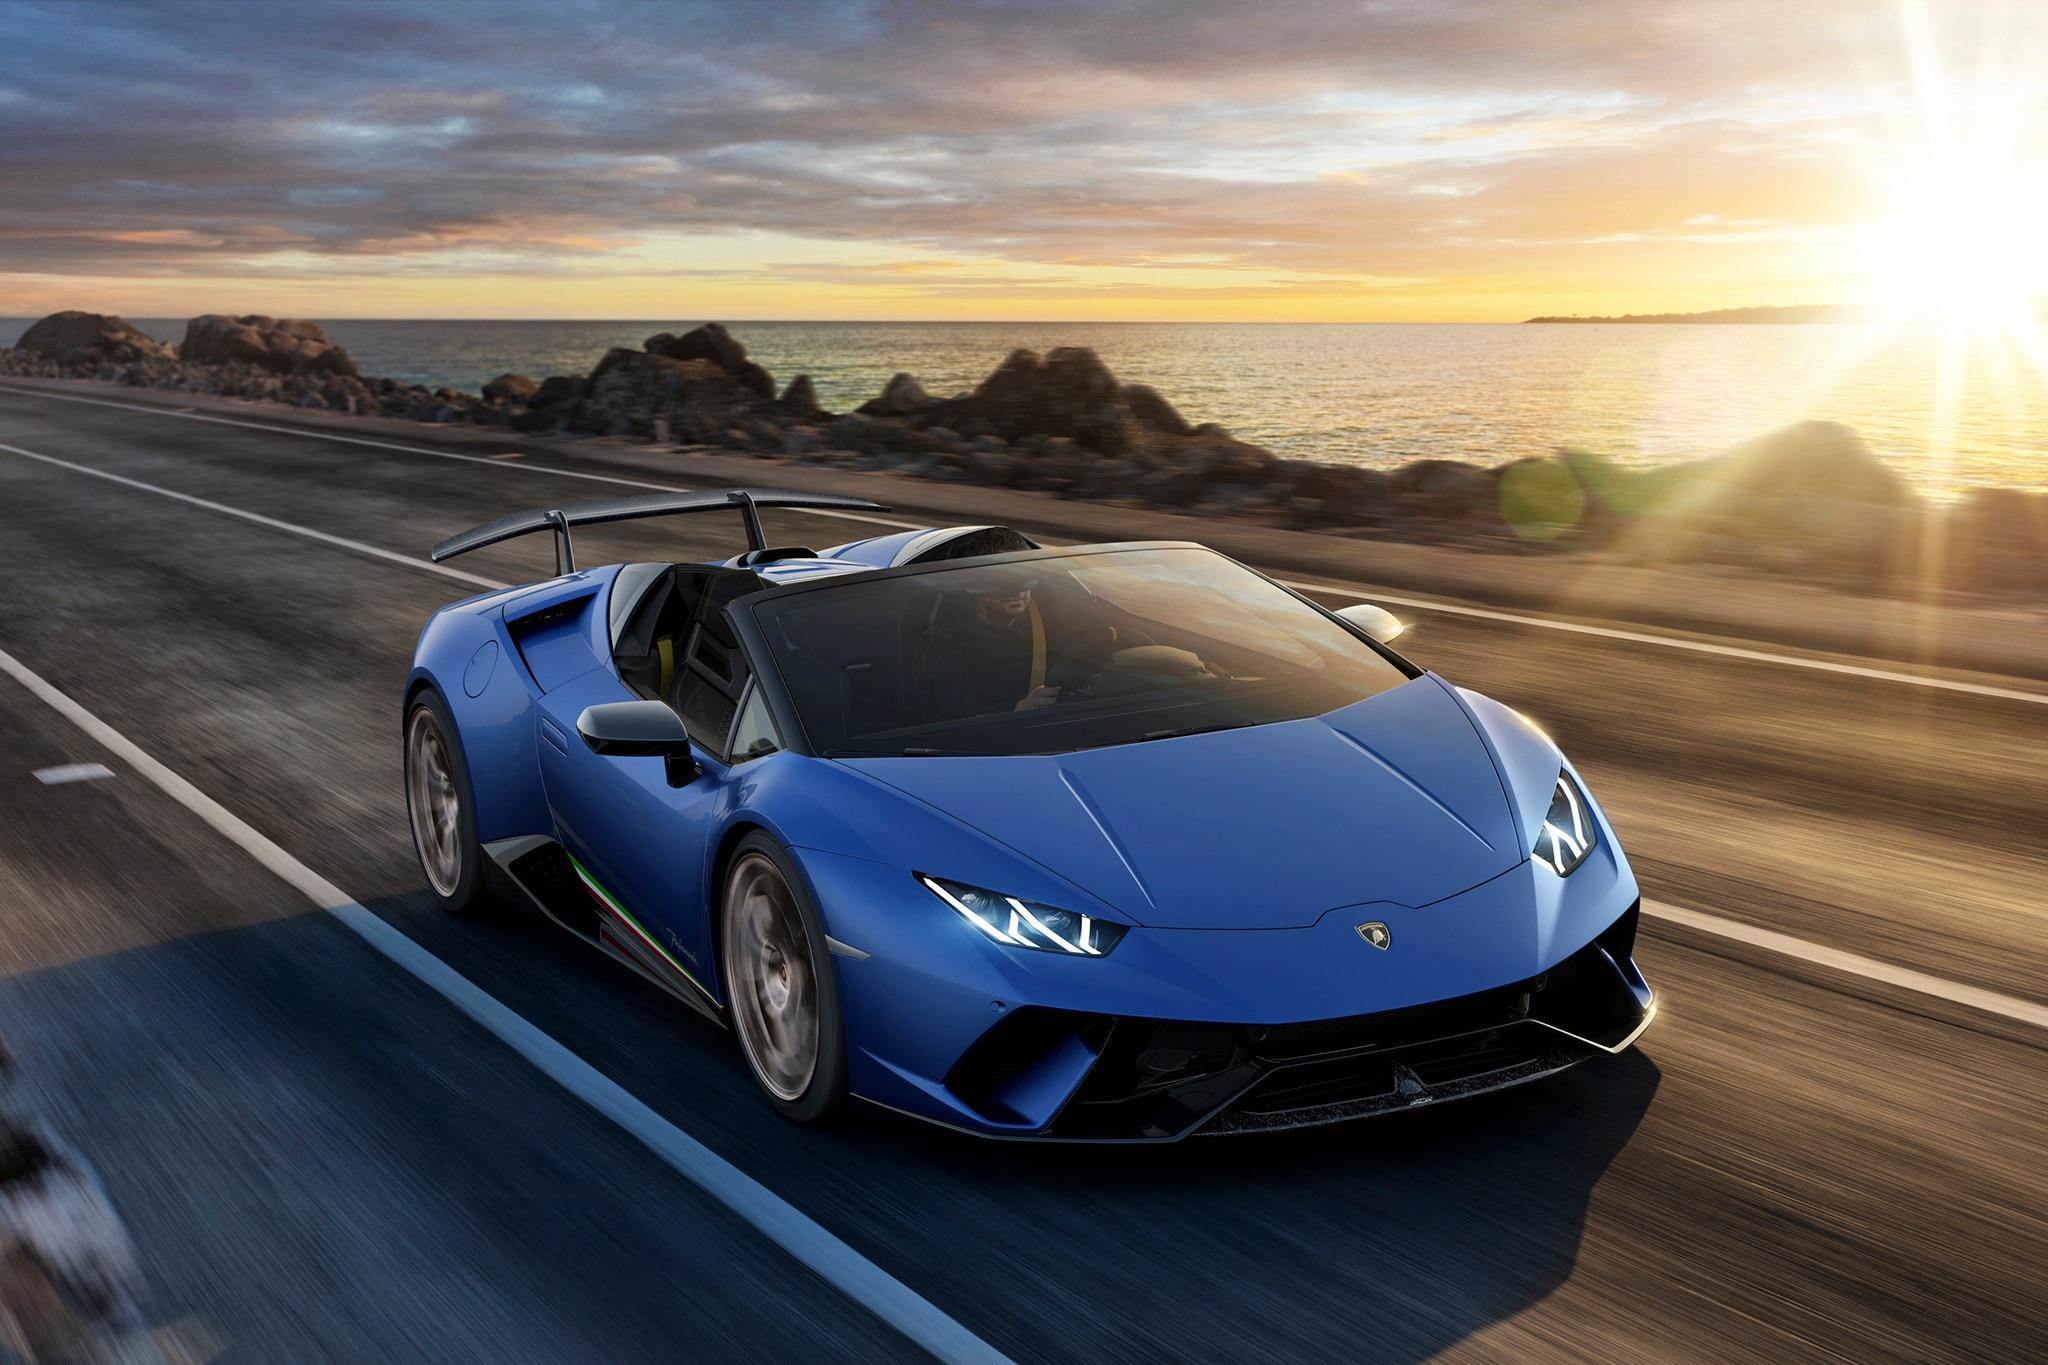 usa main htm aventador c super veloce in lp prices lamborghini stock l used sv